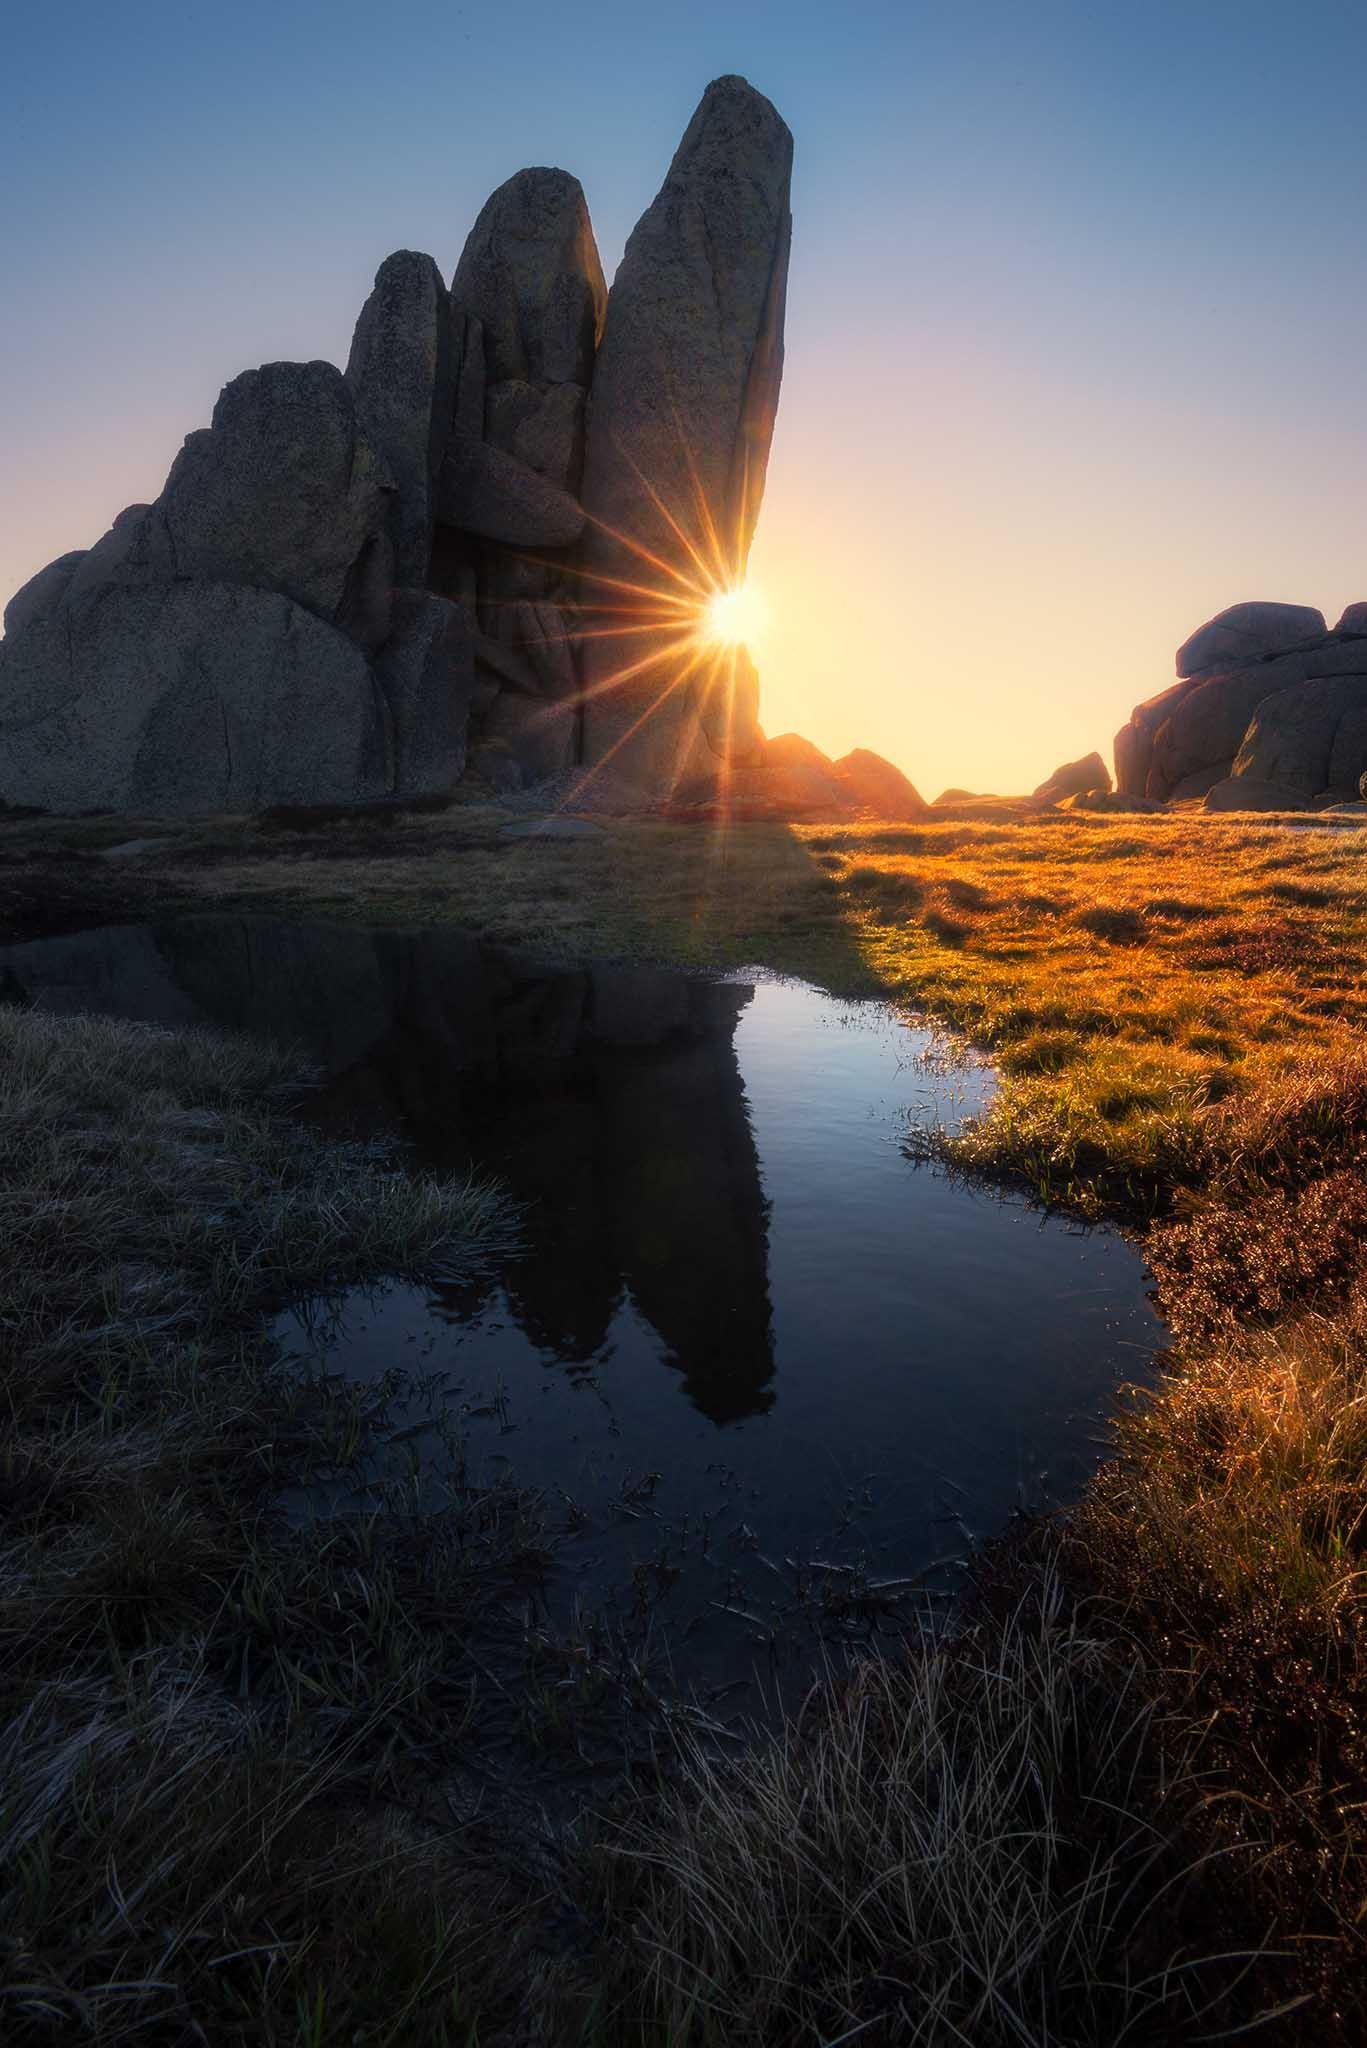 Kosciuszko National Park sunstar.